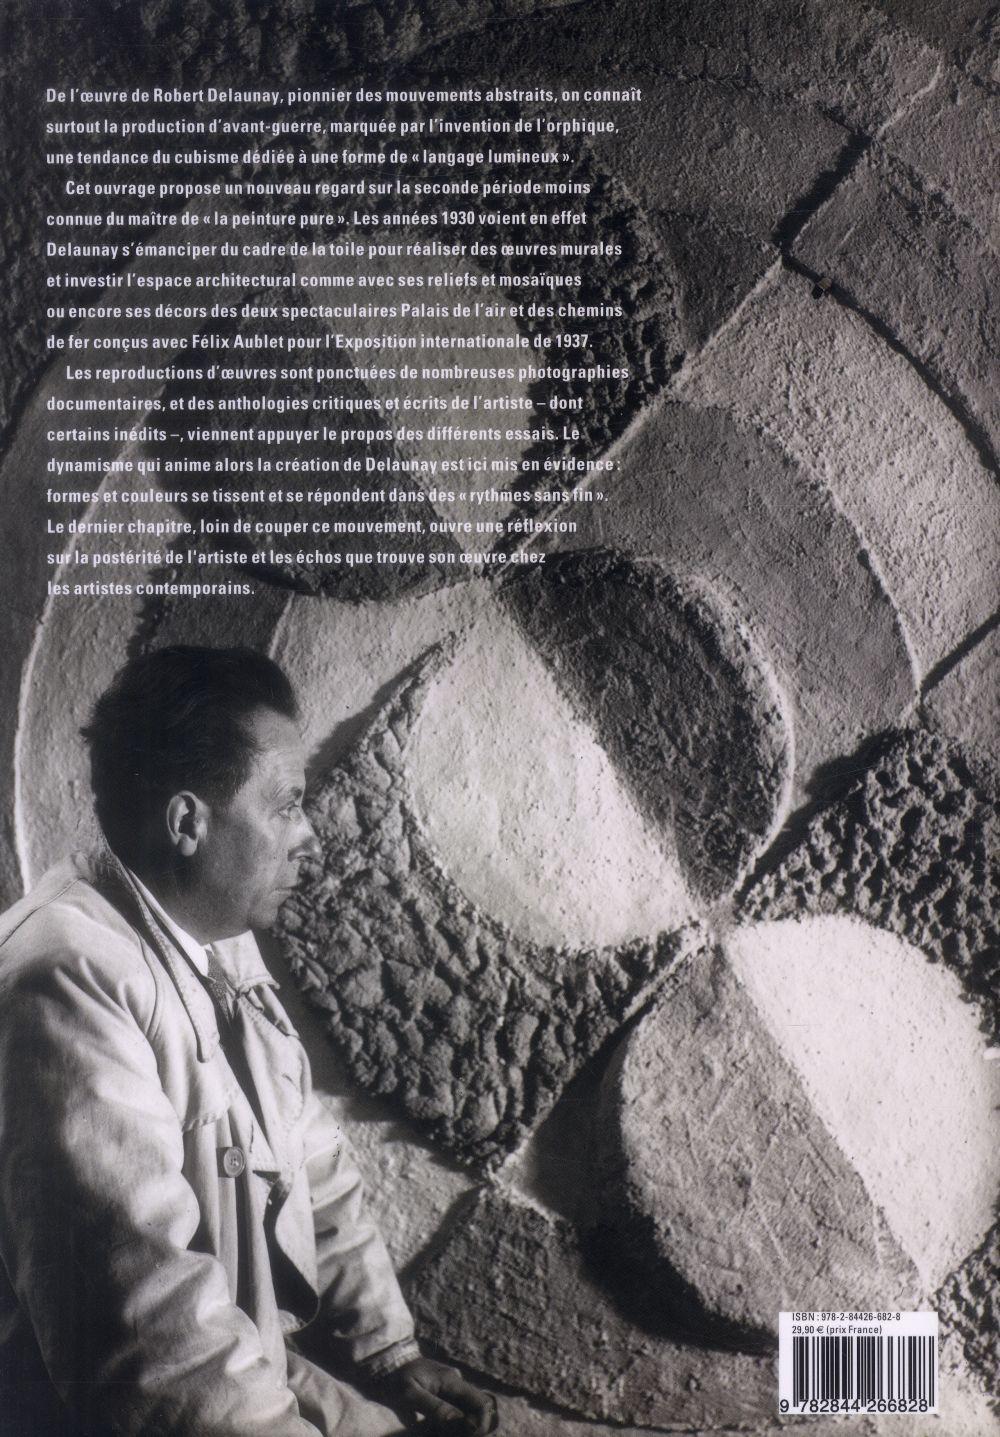 Robert Delaunay, rythmes sans fin